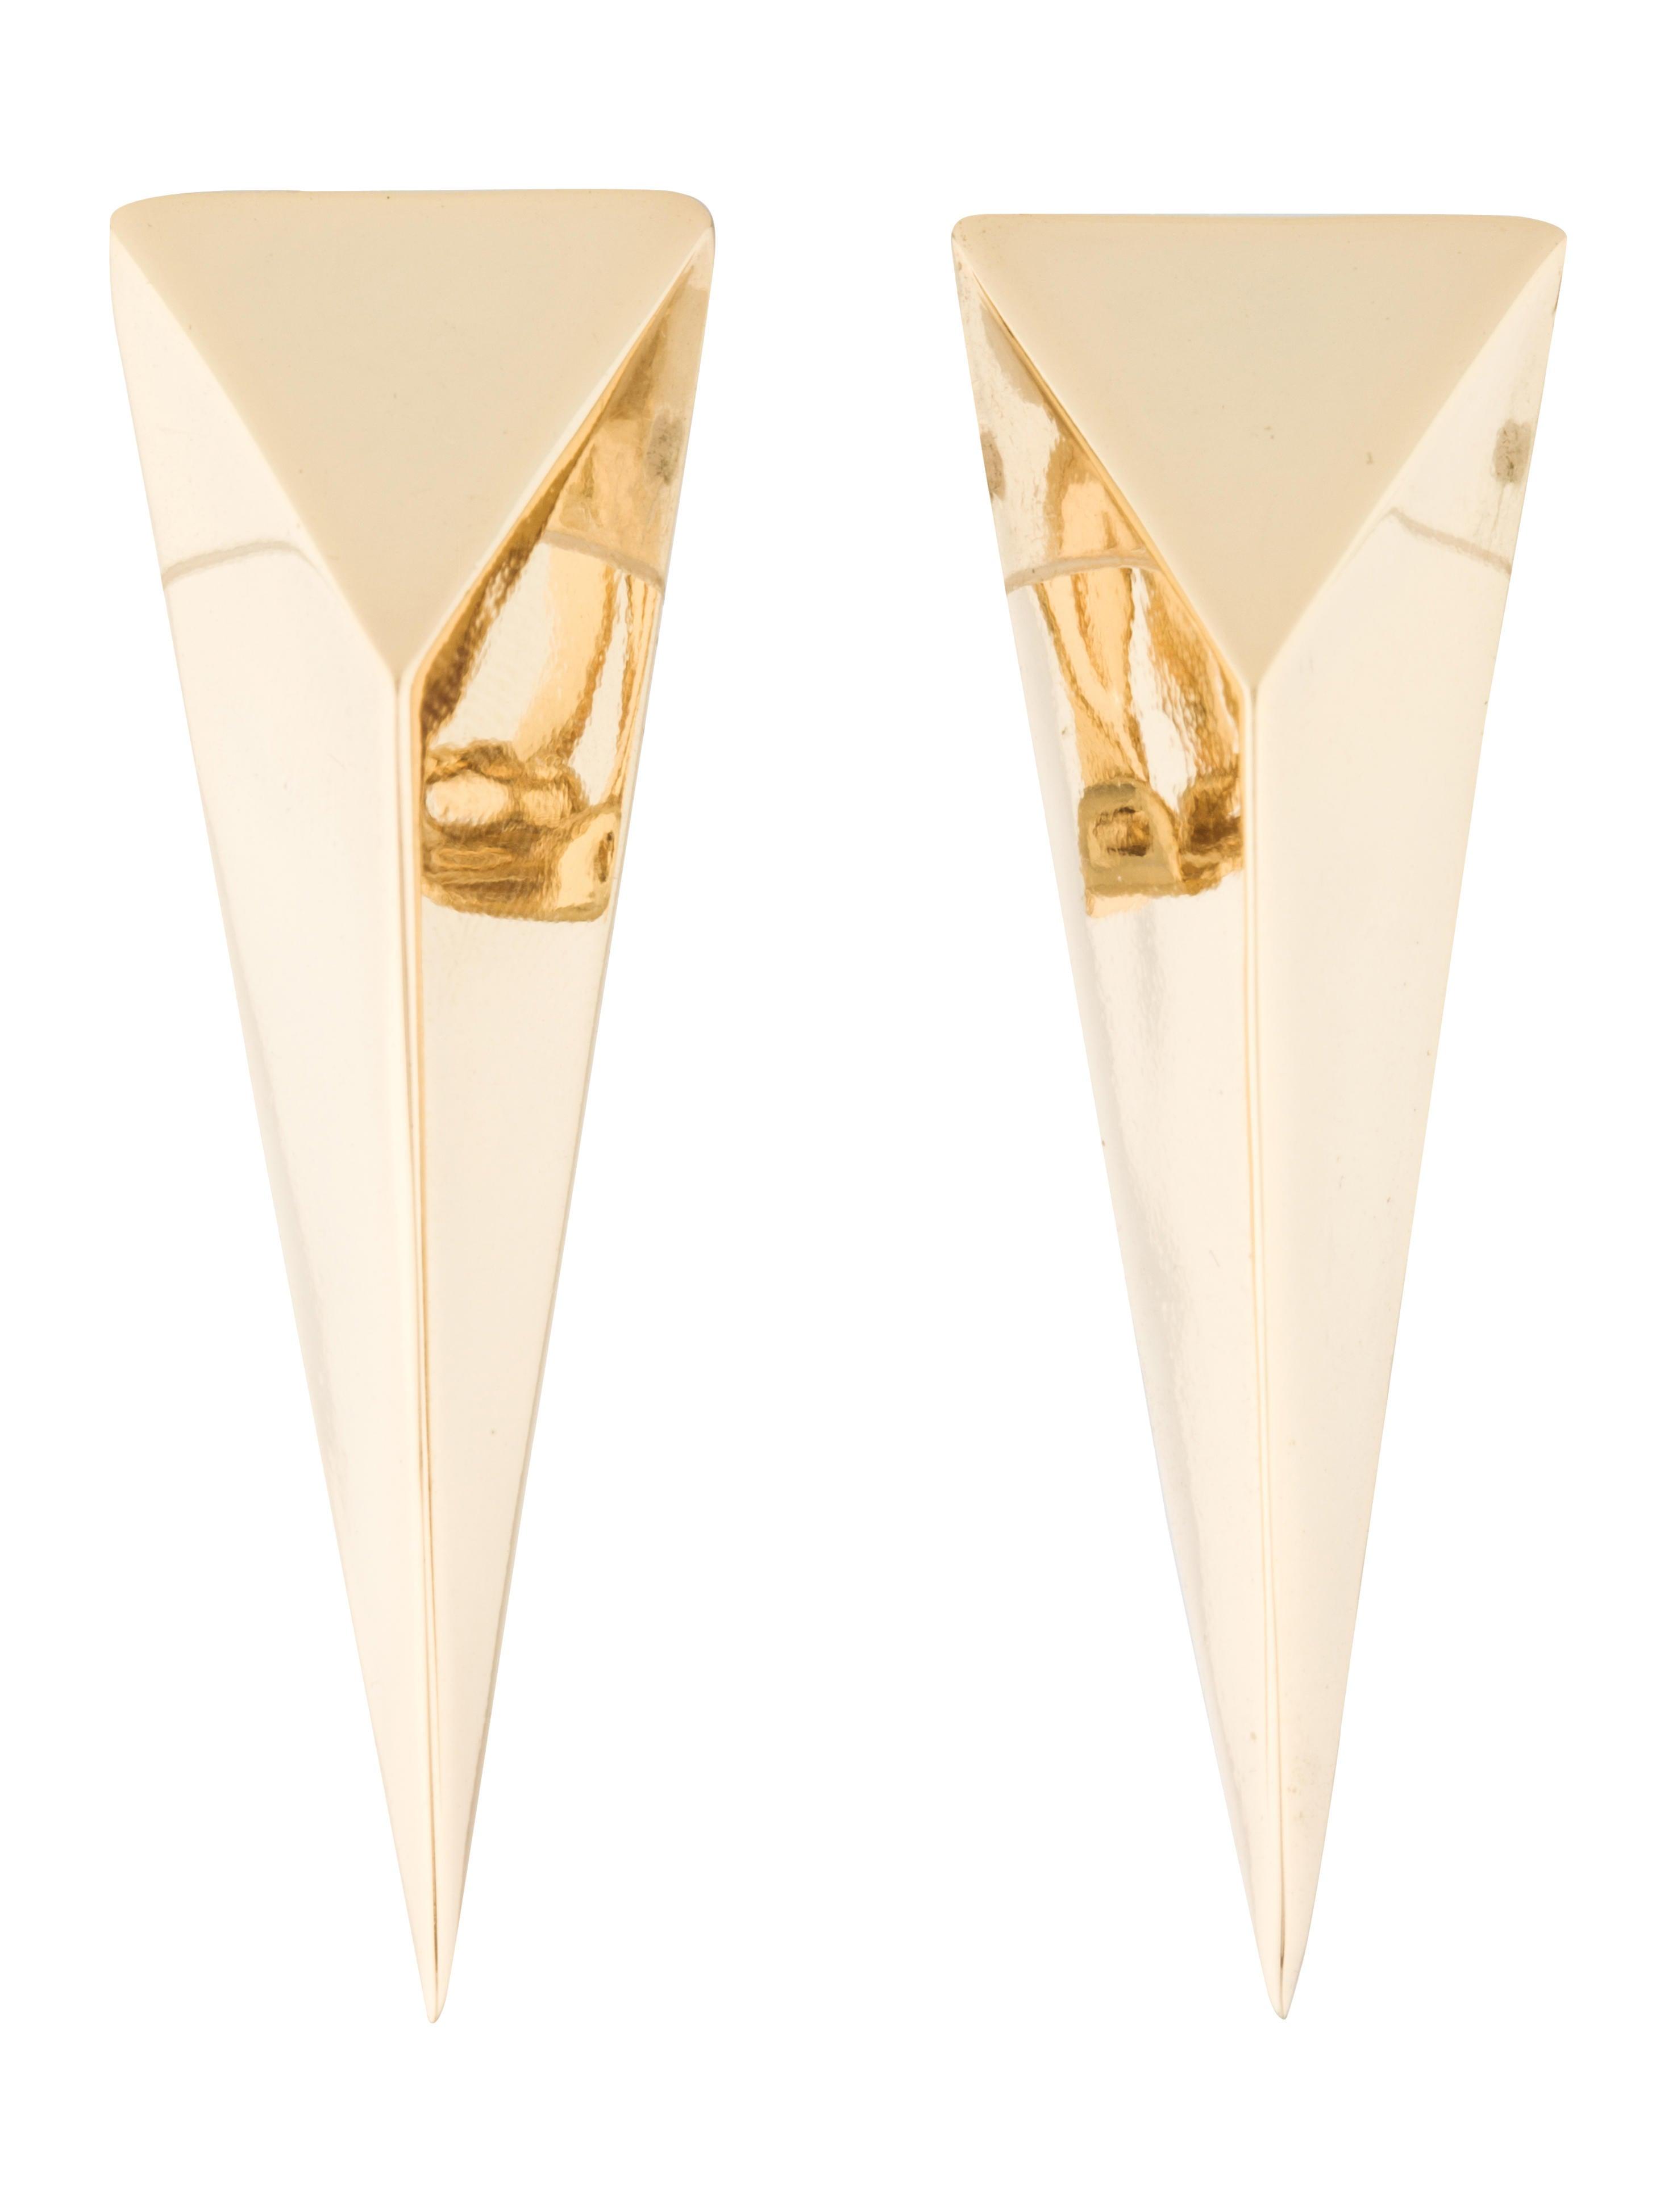 Alexis Bittar Extra Large Pyramid Clip Earring ZAGMpIk5ug